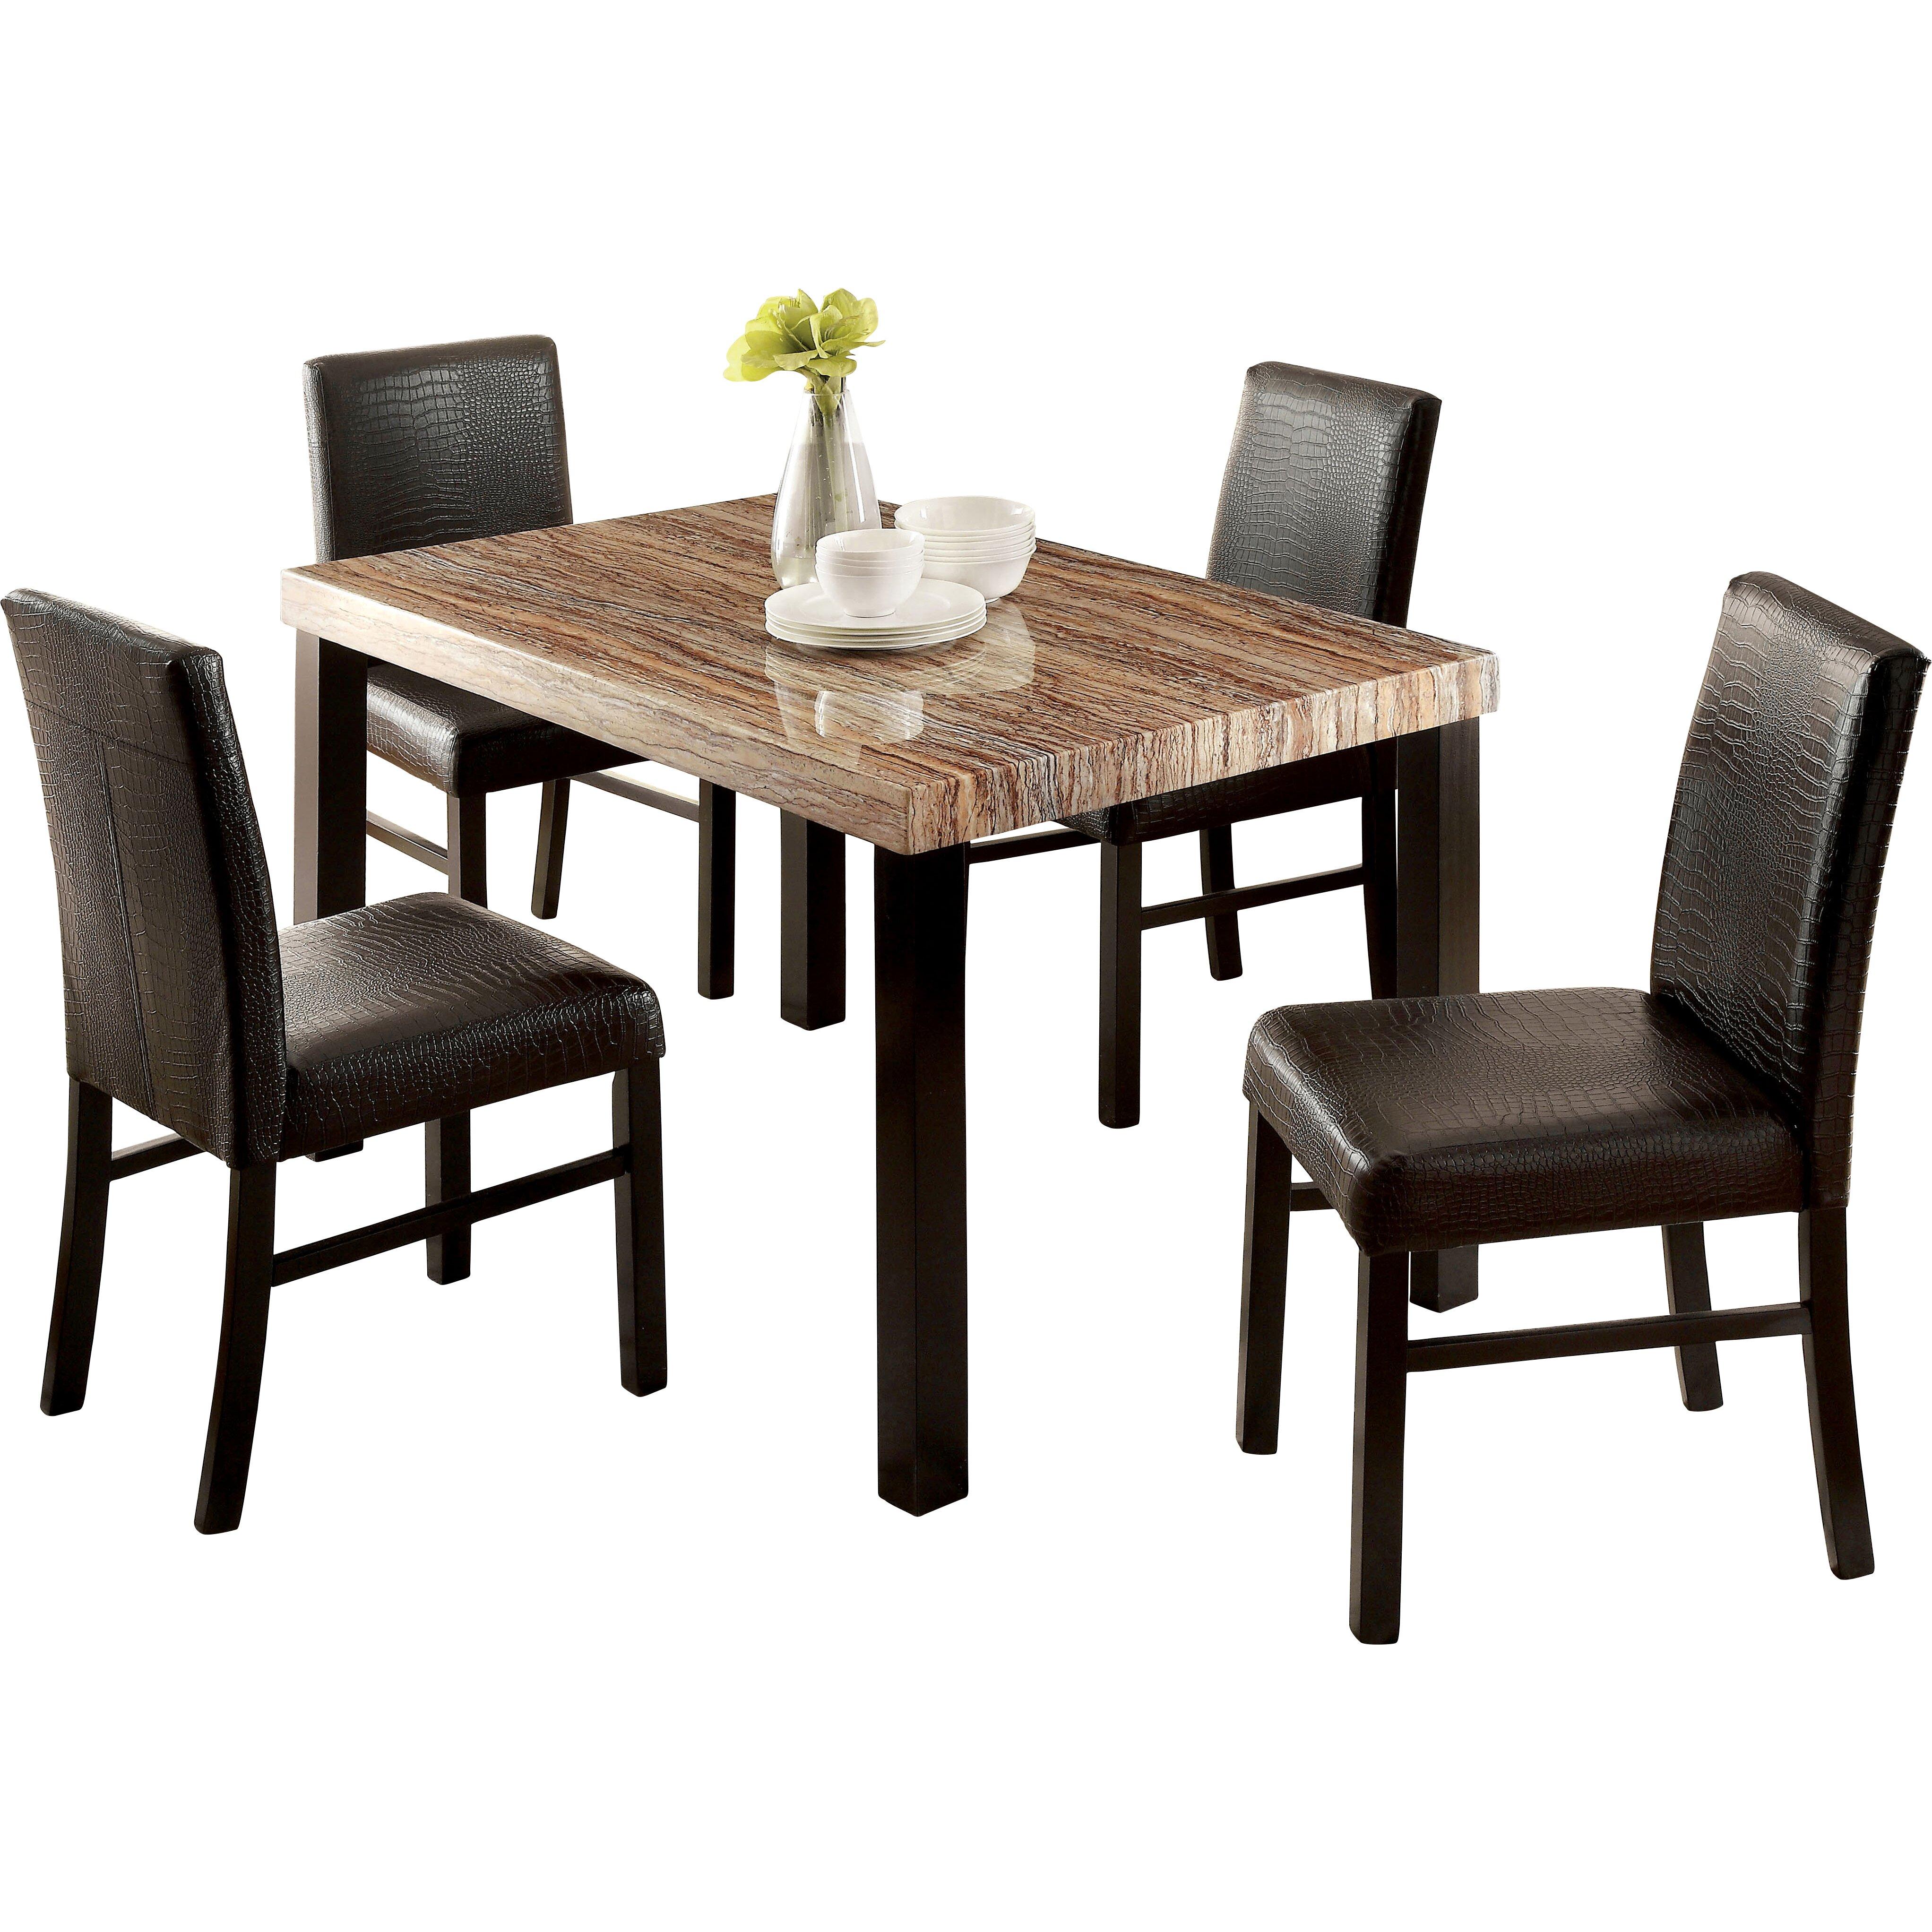 Hokku designs baylor 5 piece dining set reviews wayfair for Hokku designs dining room furniture